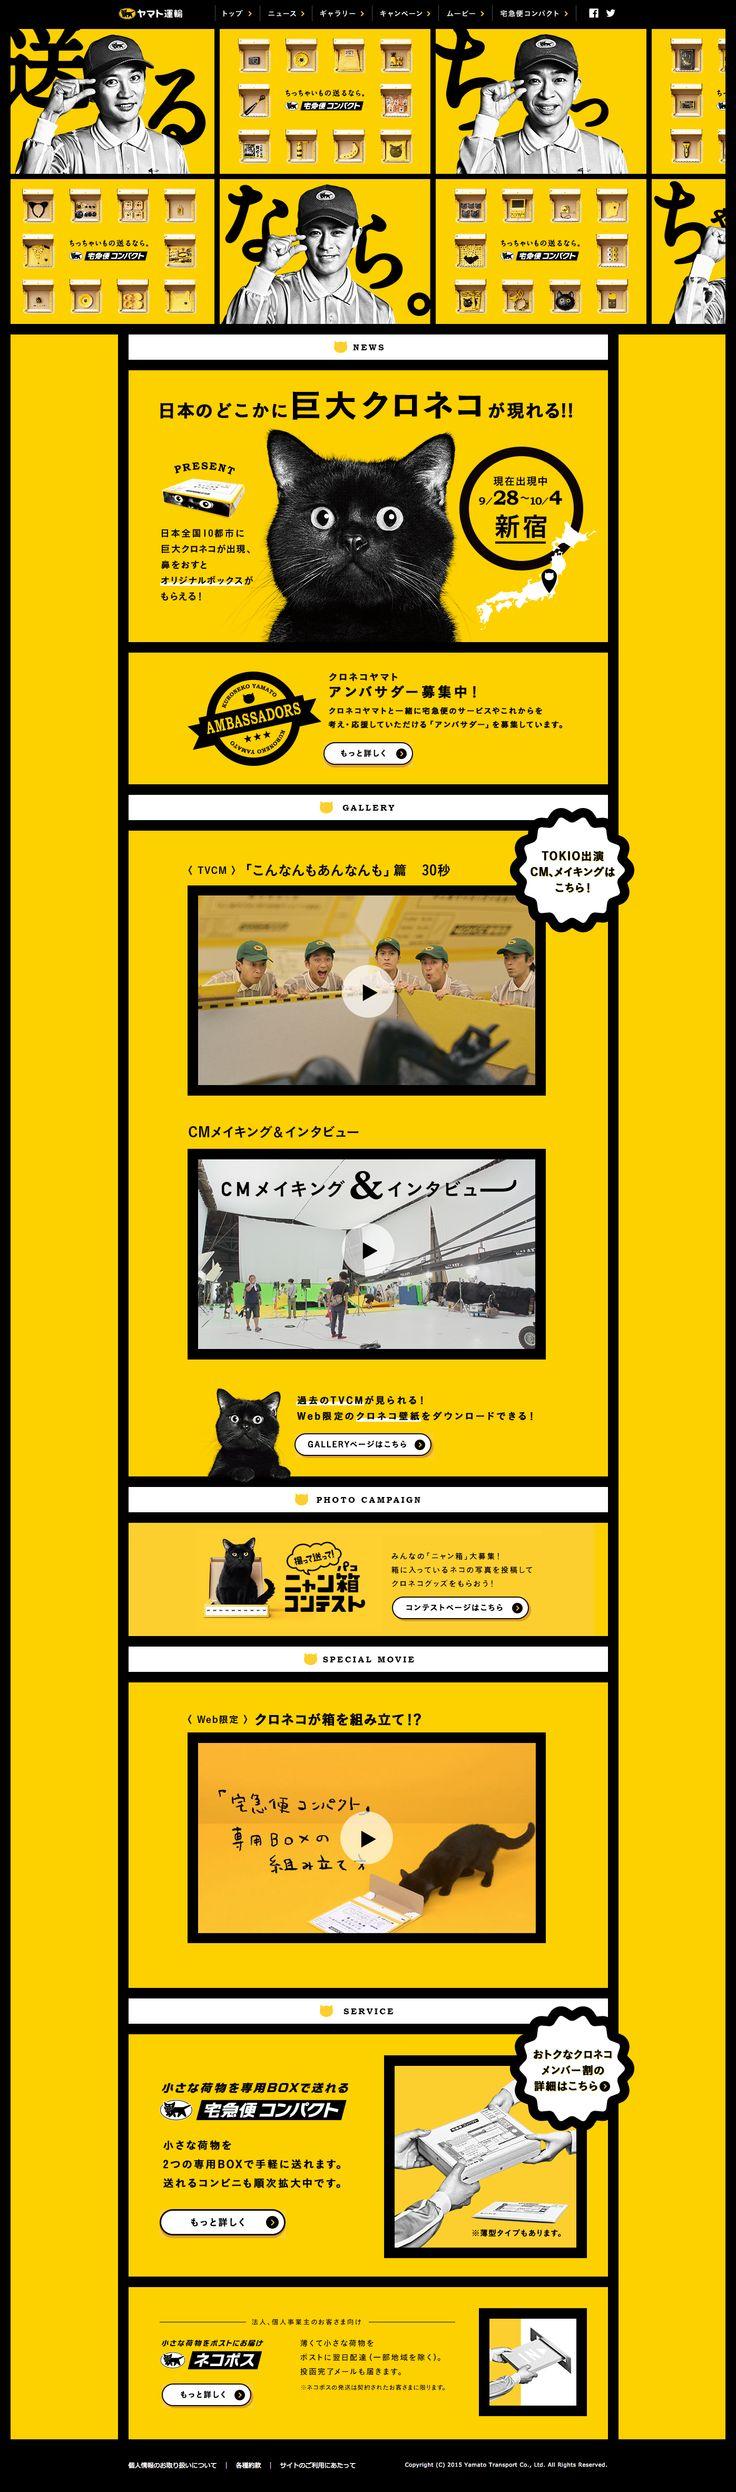 http://www.kuronekoyamato.co.jp/campaign/compactcmp/index.html?cid=ytc_gdn_ccmpc04